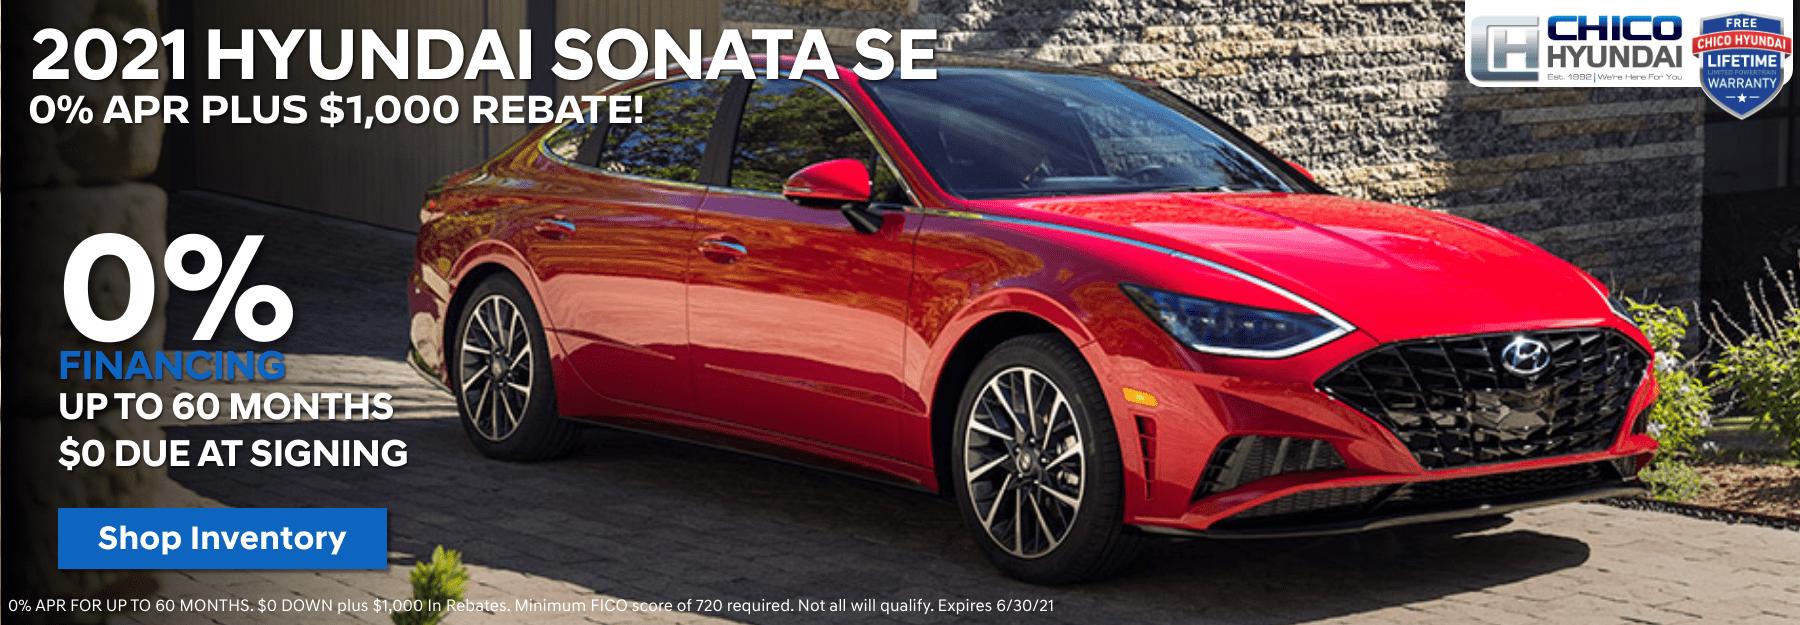 APR OFFER for Sonata SE-1800x625px